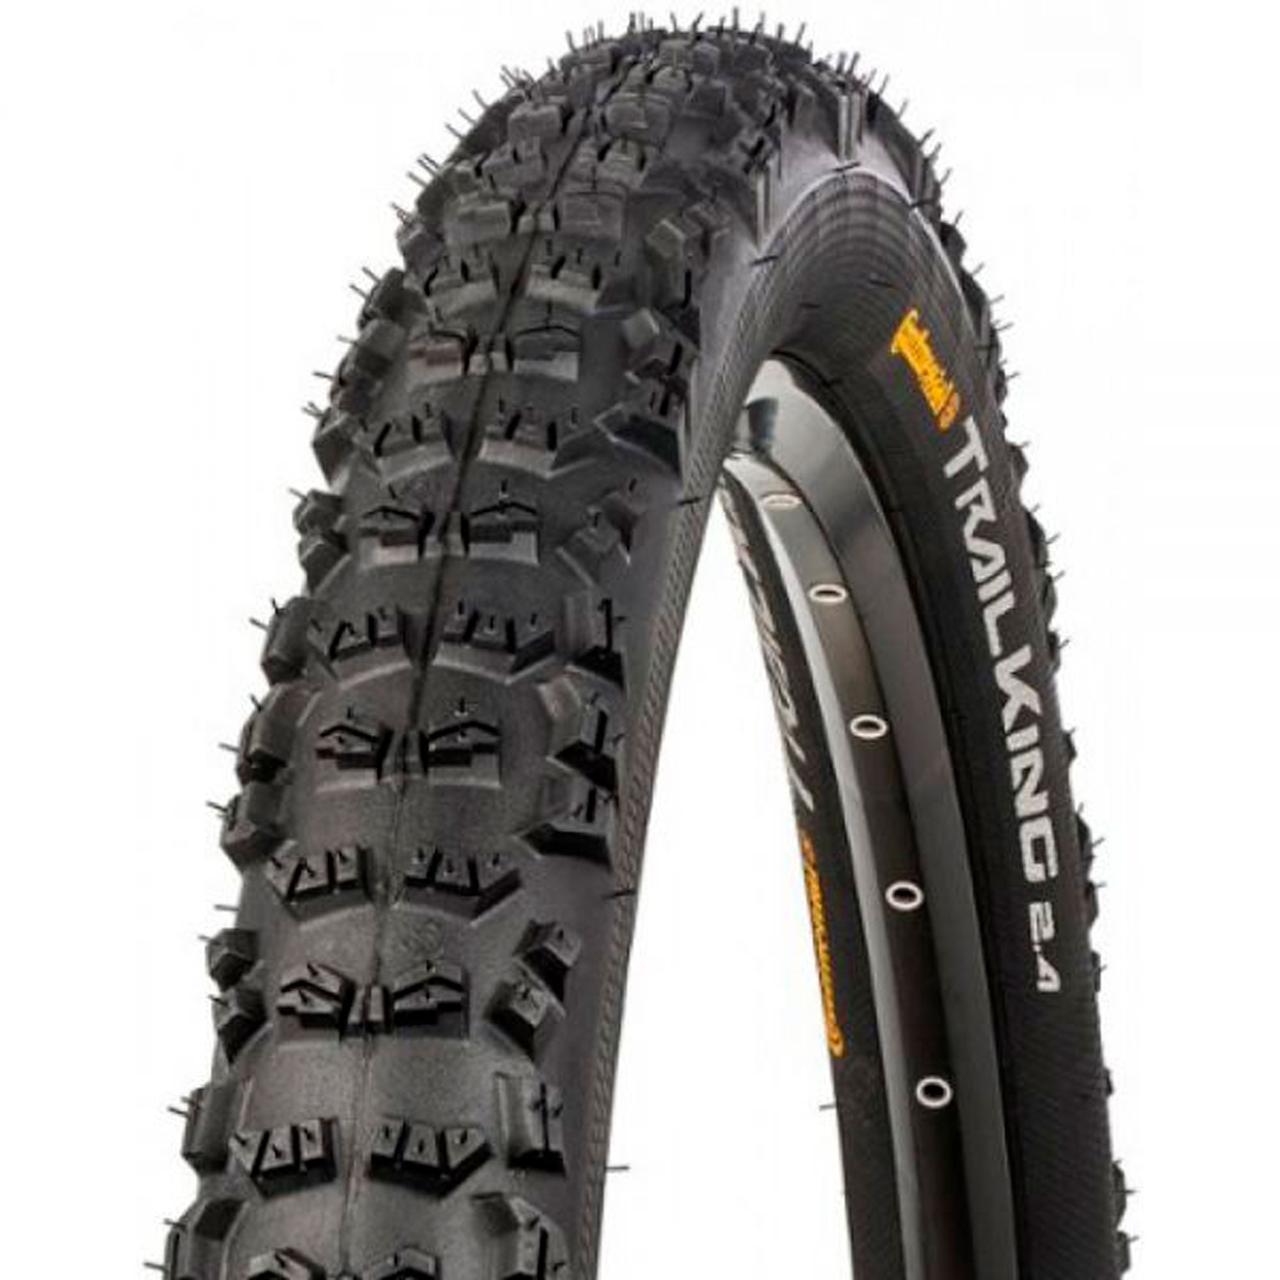 "Покрышка Continental Trail King 2.2, 27.5""x2.20, 55-584, Foldable, PureGrip, Performance, Skin, черный"